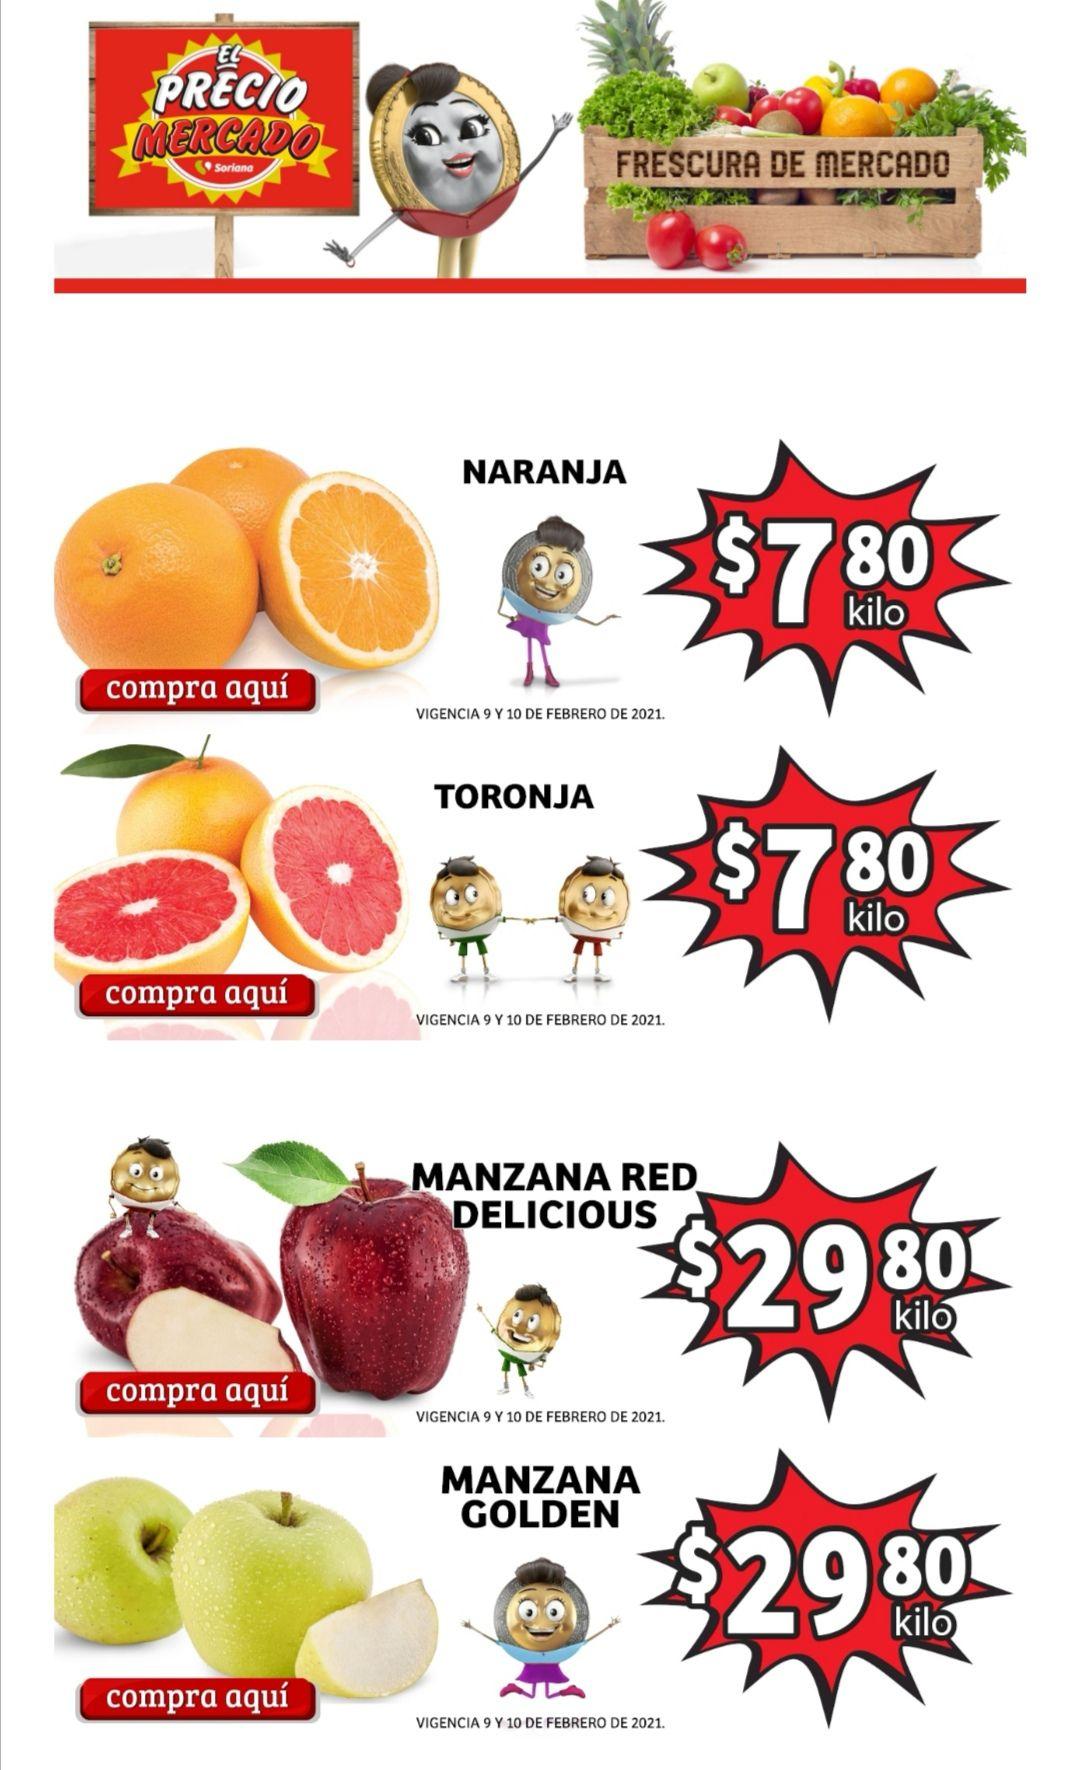 Soriana Mercado y Express: Frescura de Mercado 9 y 10 Febrero: Naranja ó Toronja $7.80 kg... Manzana Red ó Golden a Granel $29.80 kg.